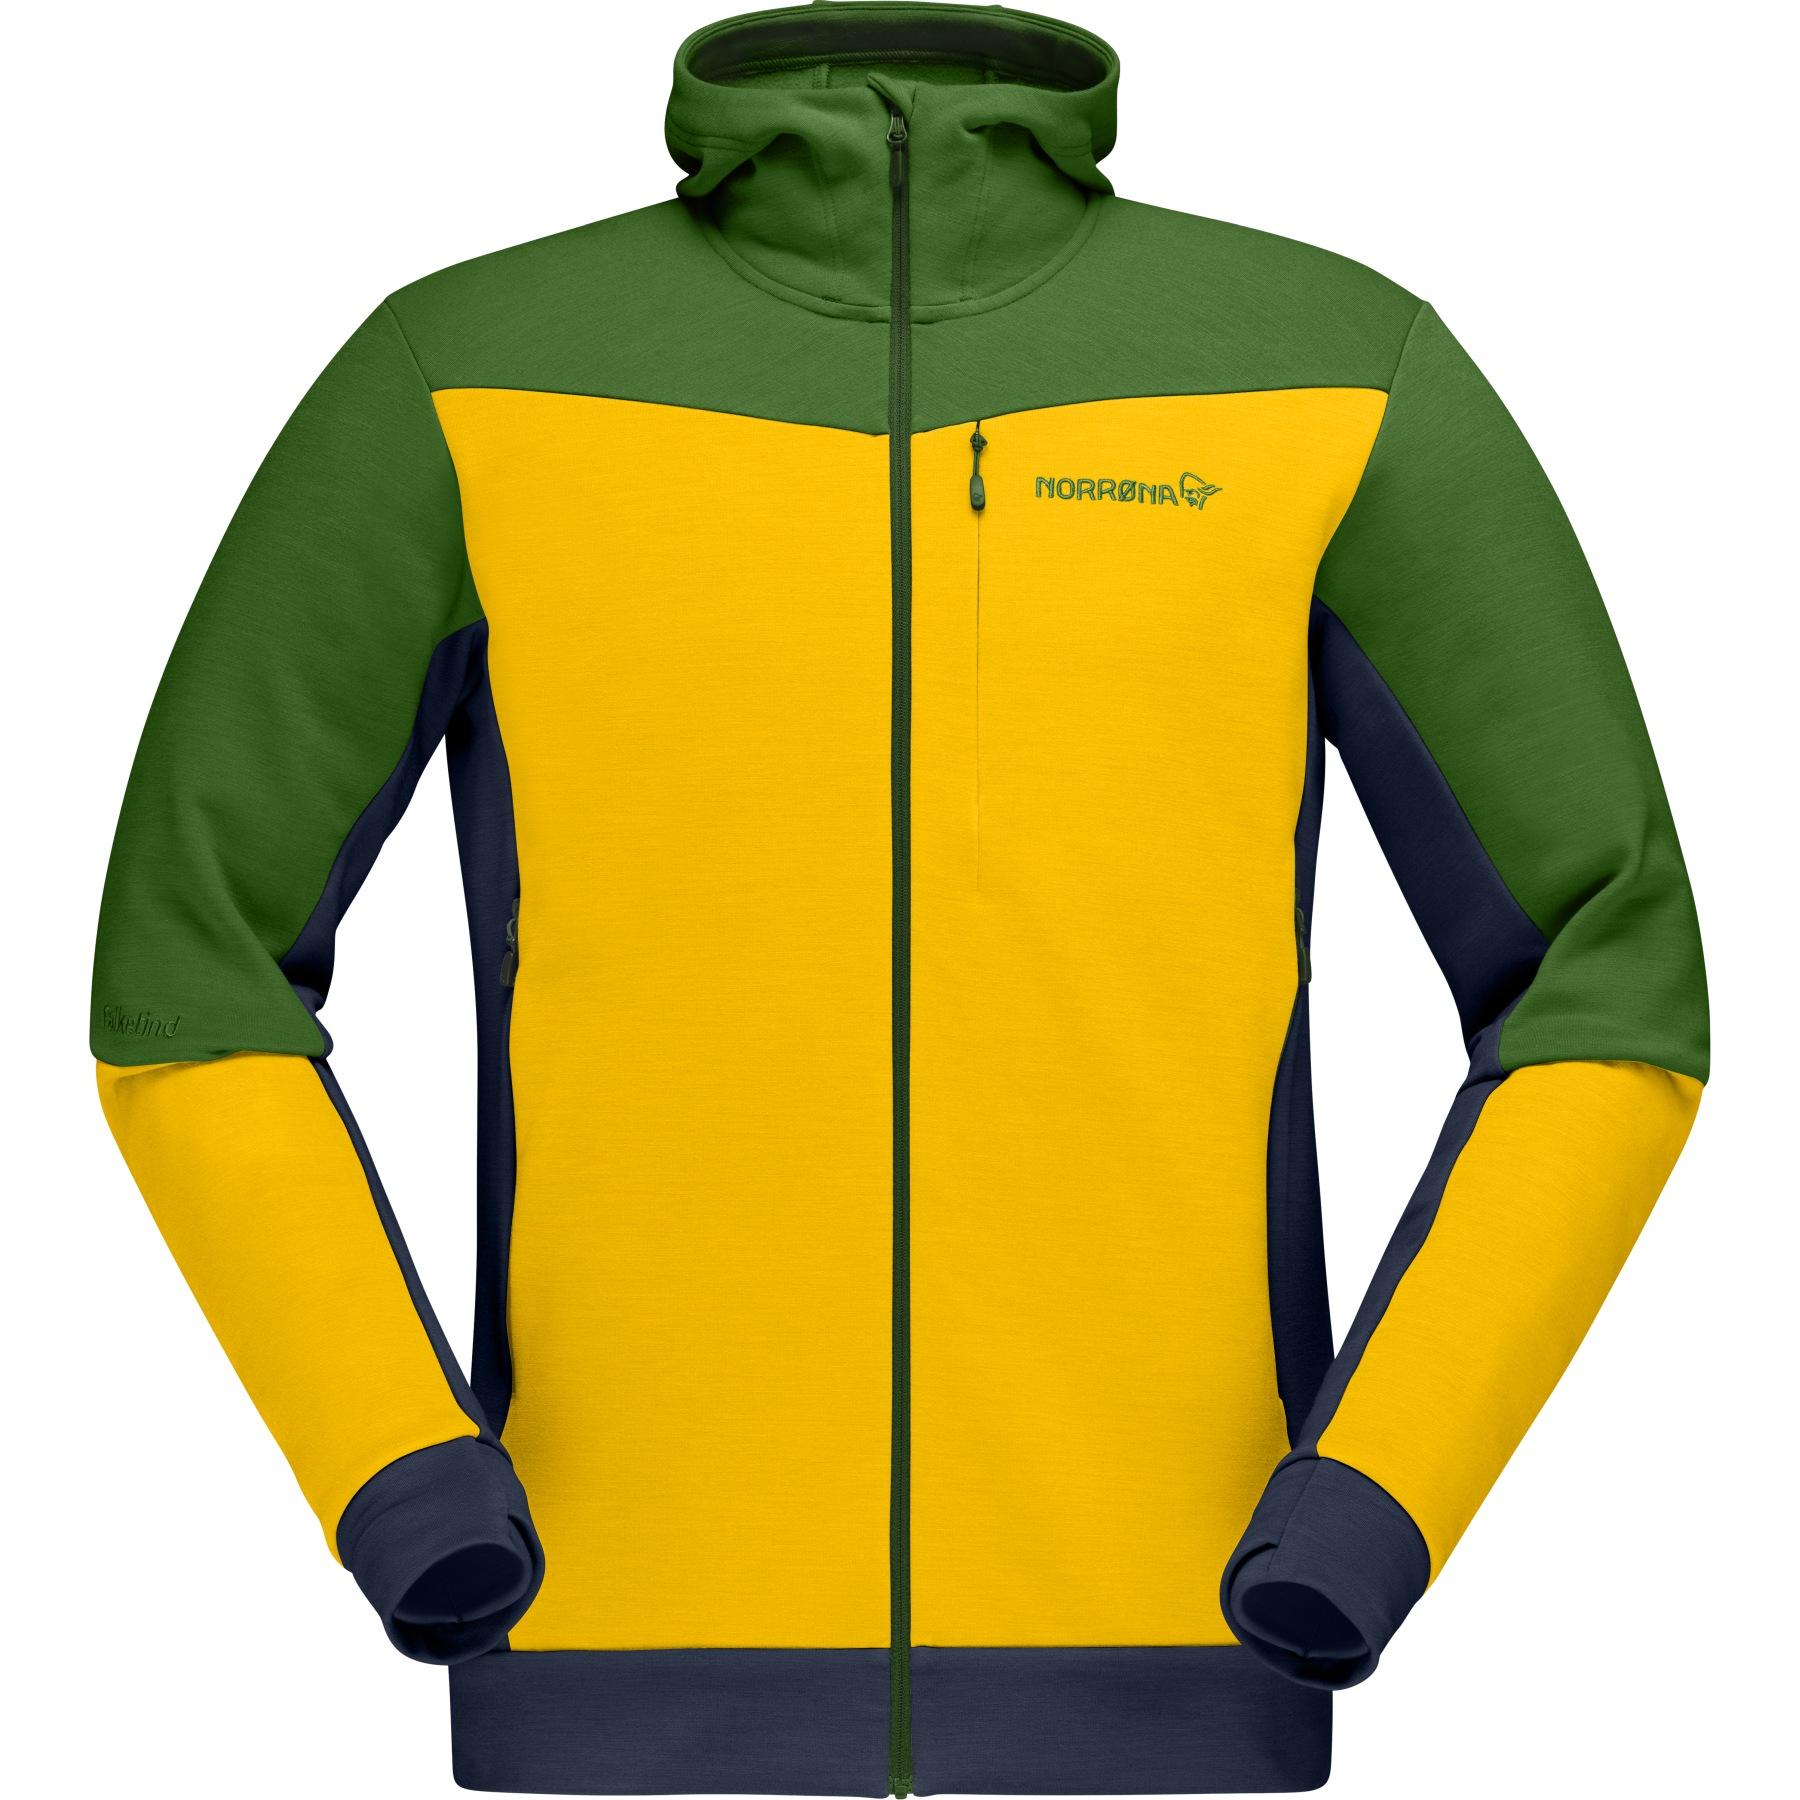 Produktbild von Norrona falketind warmwool2 stretch Zip Hood Herren Midlayerjacke - Lemon Chrome/Treetop